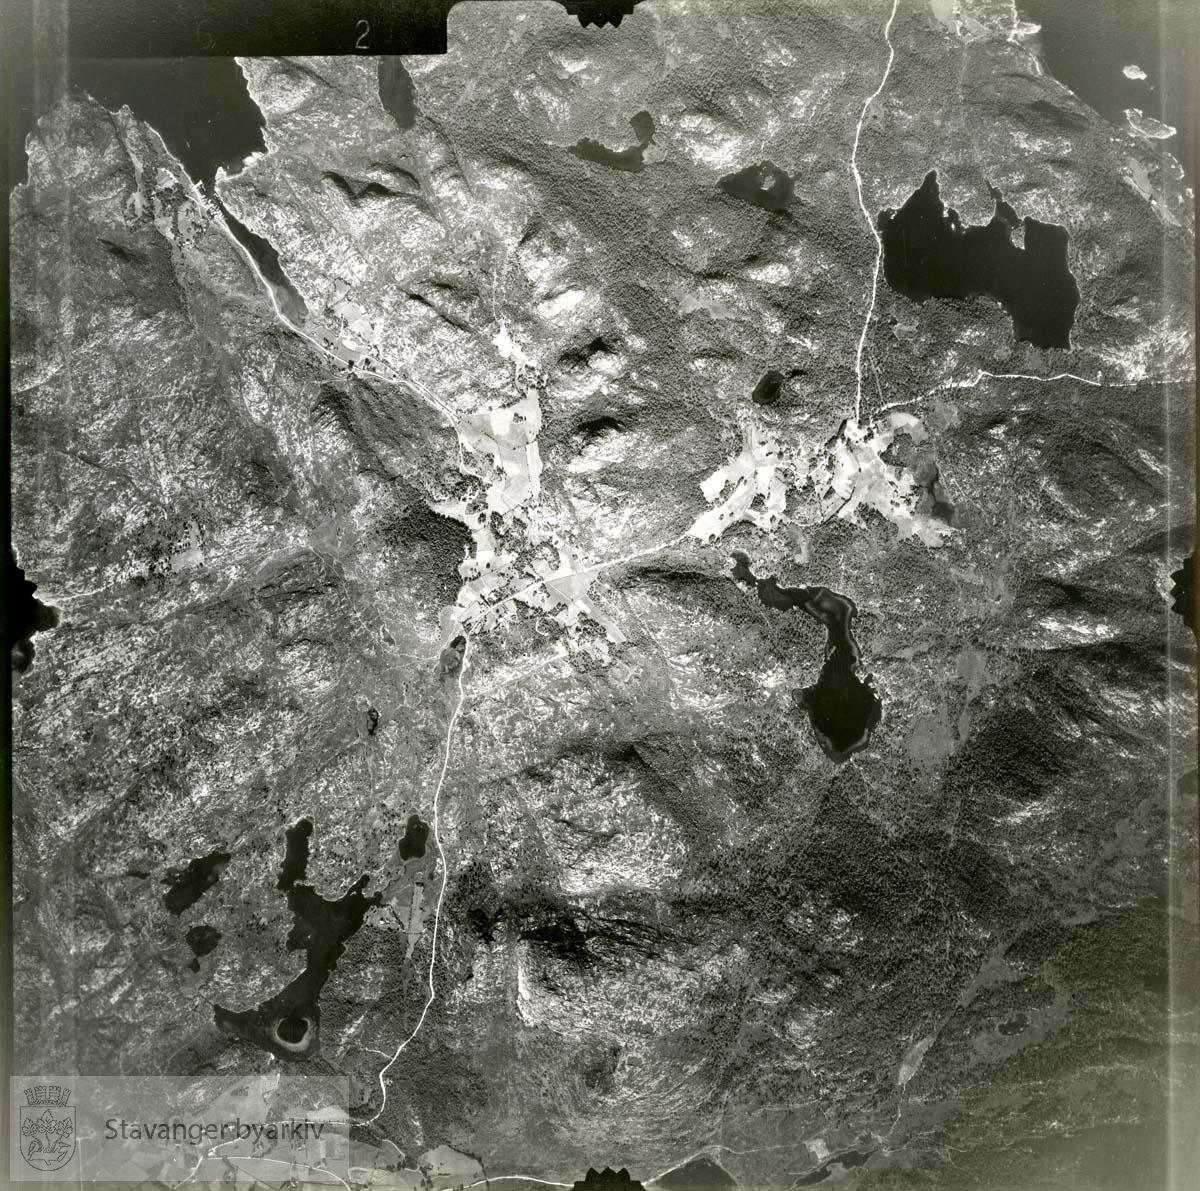 Jfr. kart/fotoplan I23/662..Eltravågvatnet, Nordavatnet..Se ByStW_Uca_002 (kan lastes ned under fanen for kart på Stavangerbilder)